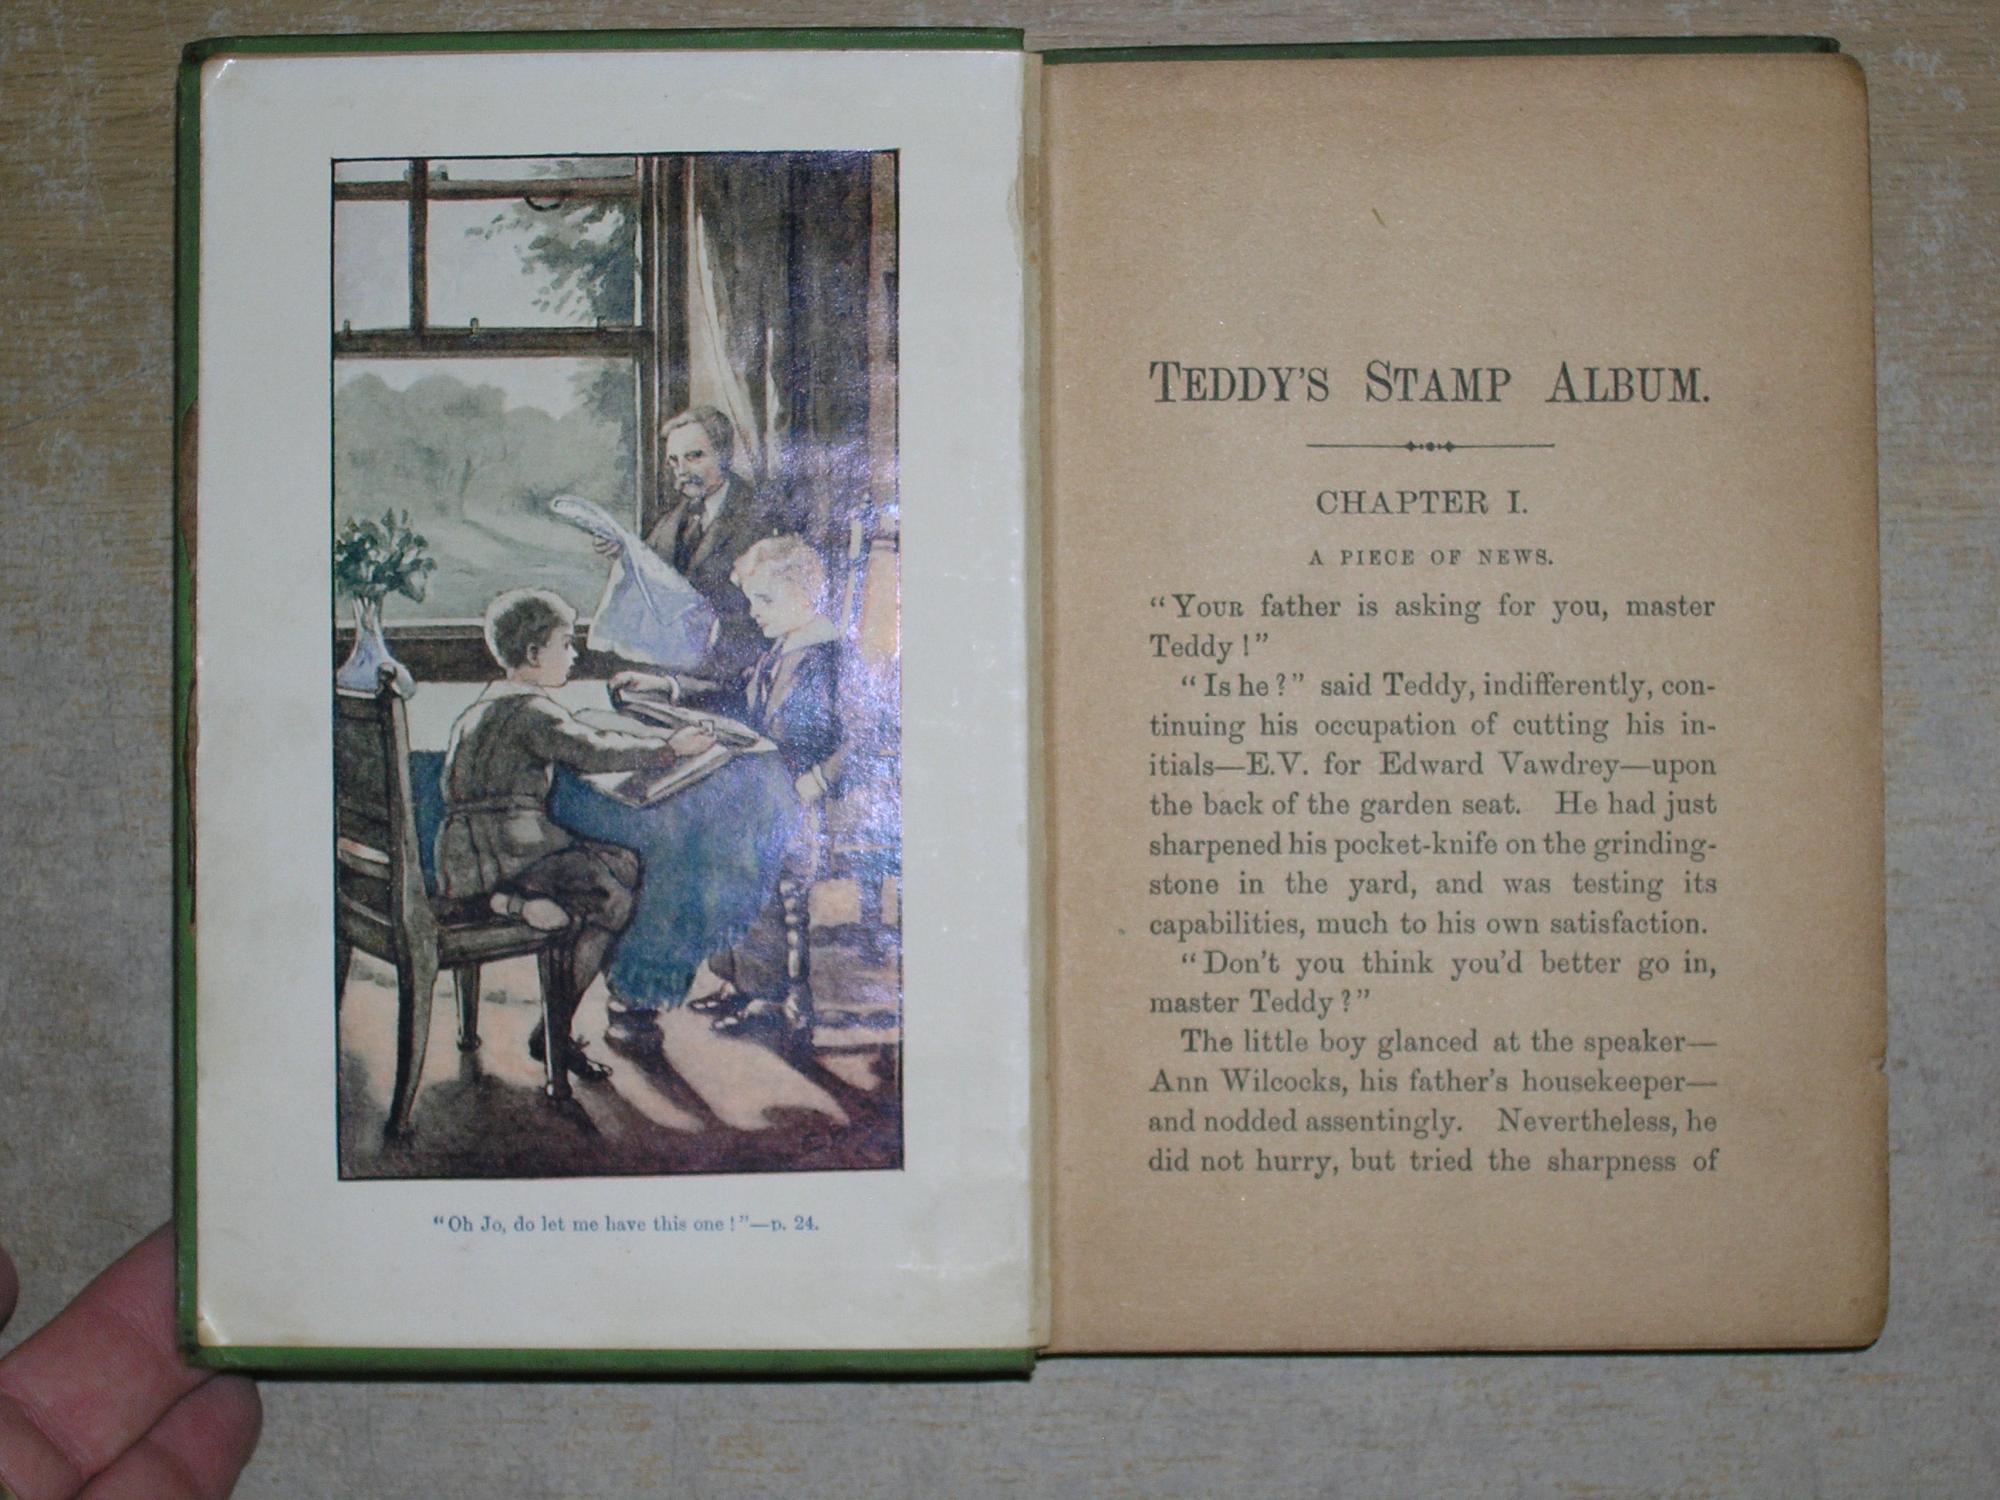 Teddy's Stamp Album